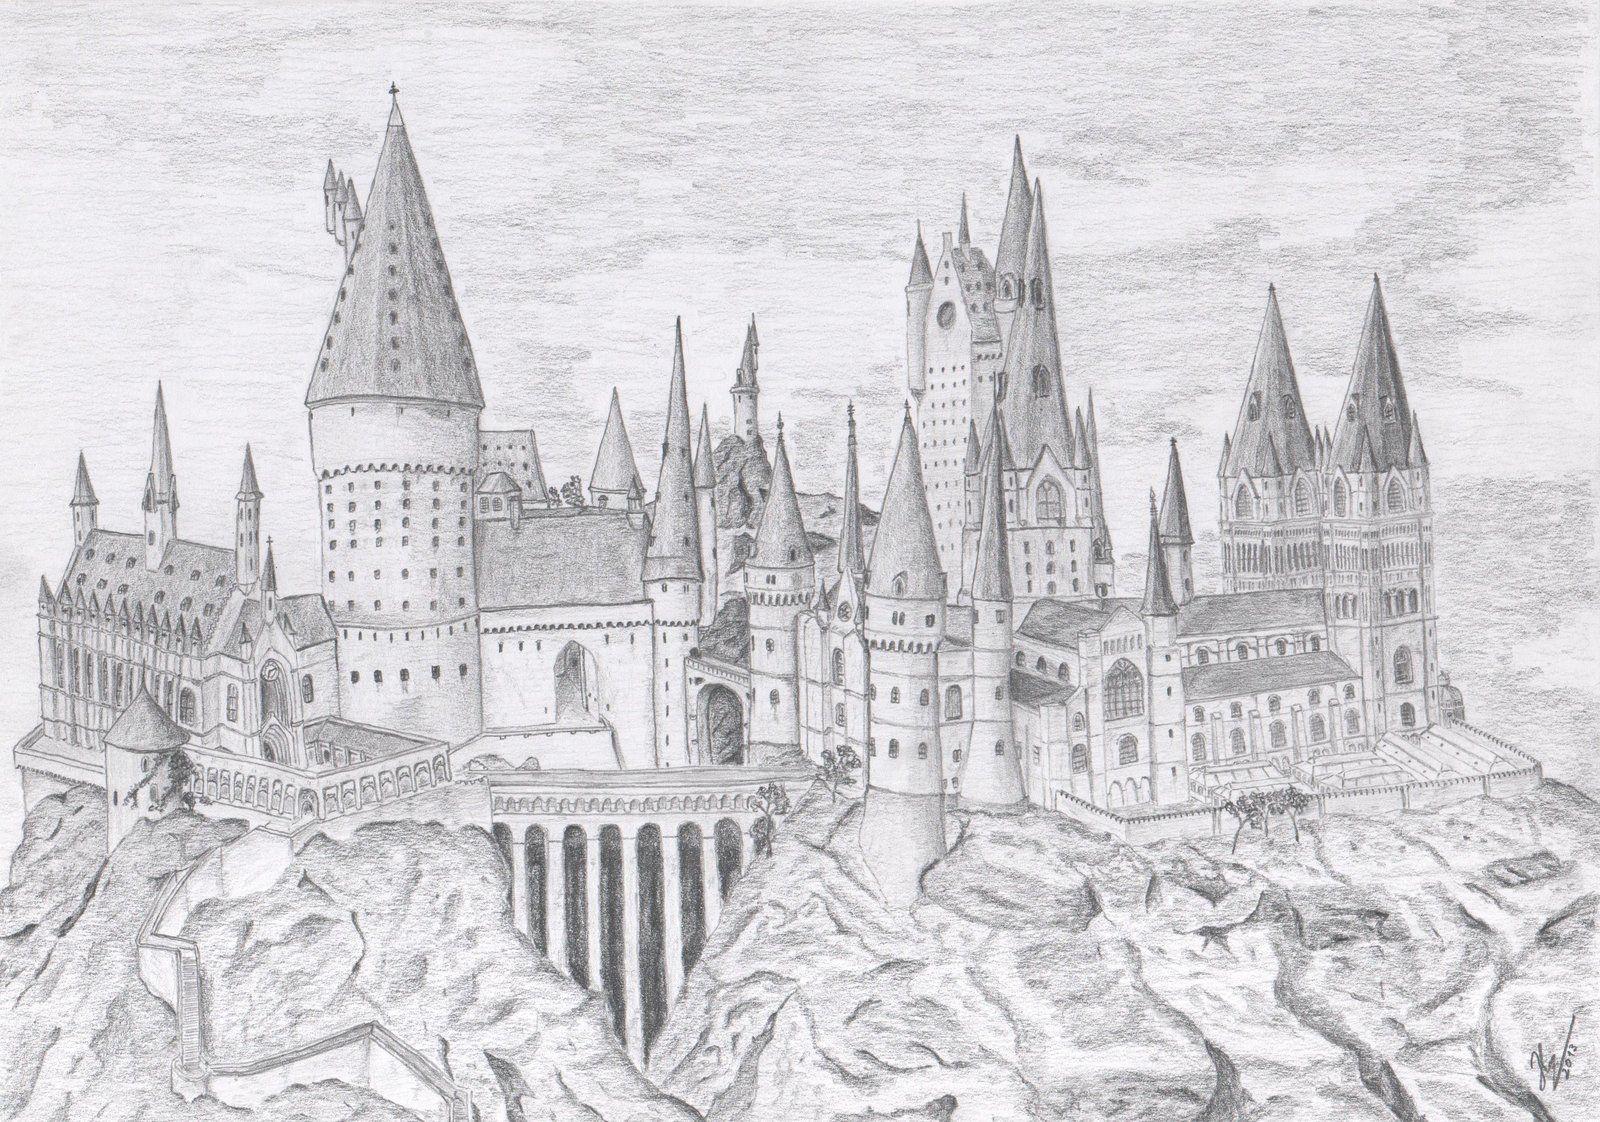 Hogwarts castle google search harry potter castle pinterest harry potter castle and searching